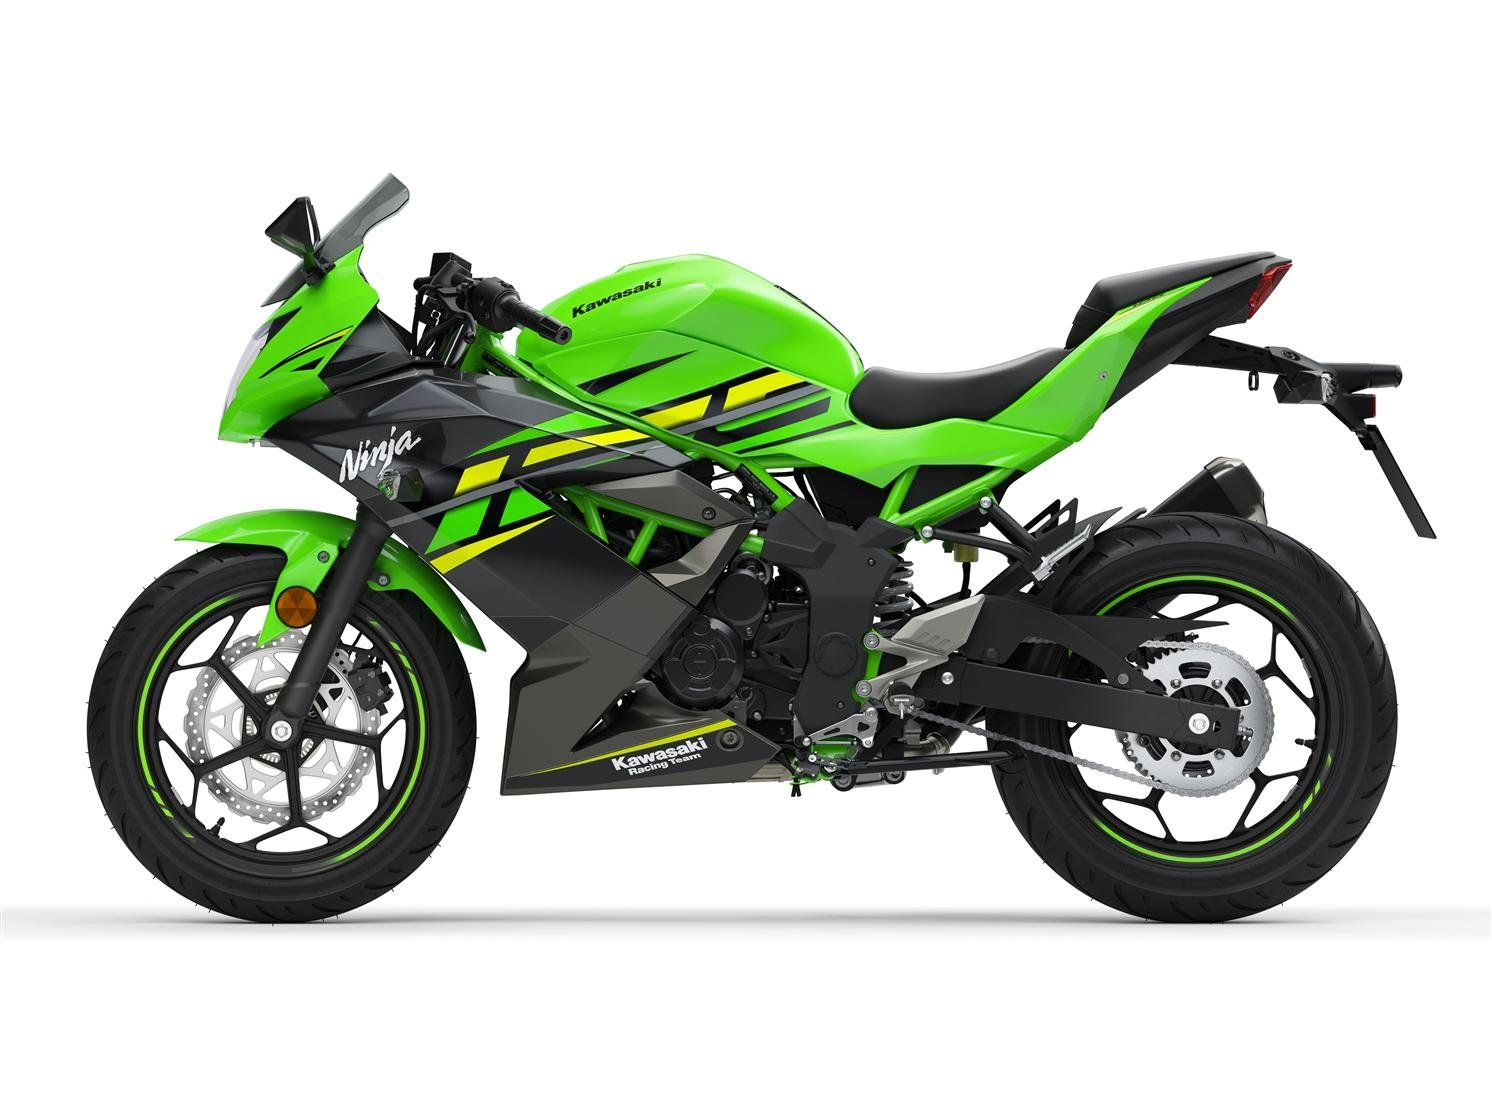 2019 Kawasaki Ninja 125 Price From Kawasaki Presents Ninja 125 Or Z125 The Toughest Choice Regarding 2019 Kawasaki Ninja Kawasaki Bikes Kawasaki Motorcycles